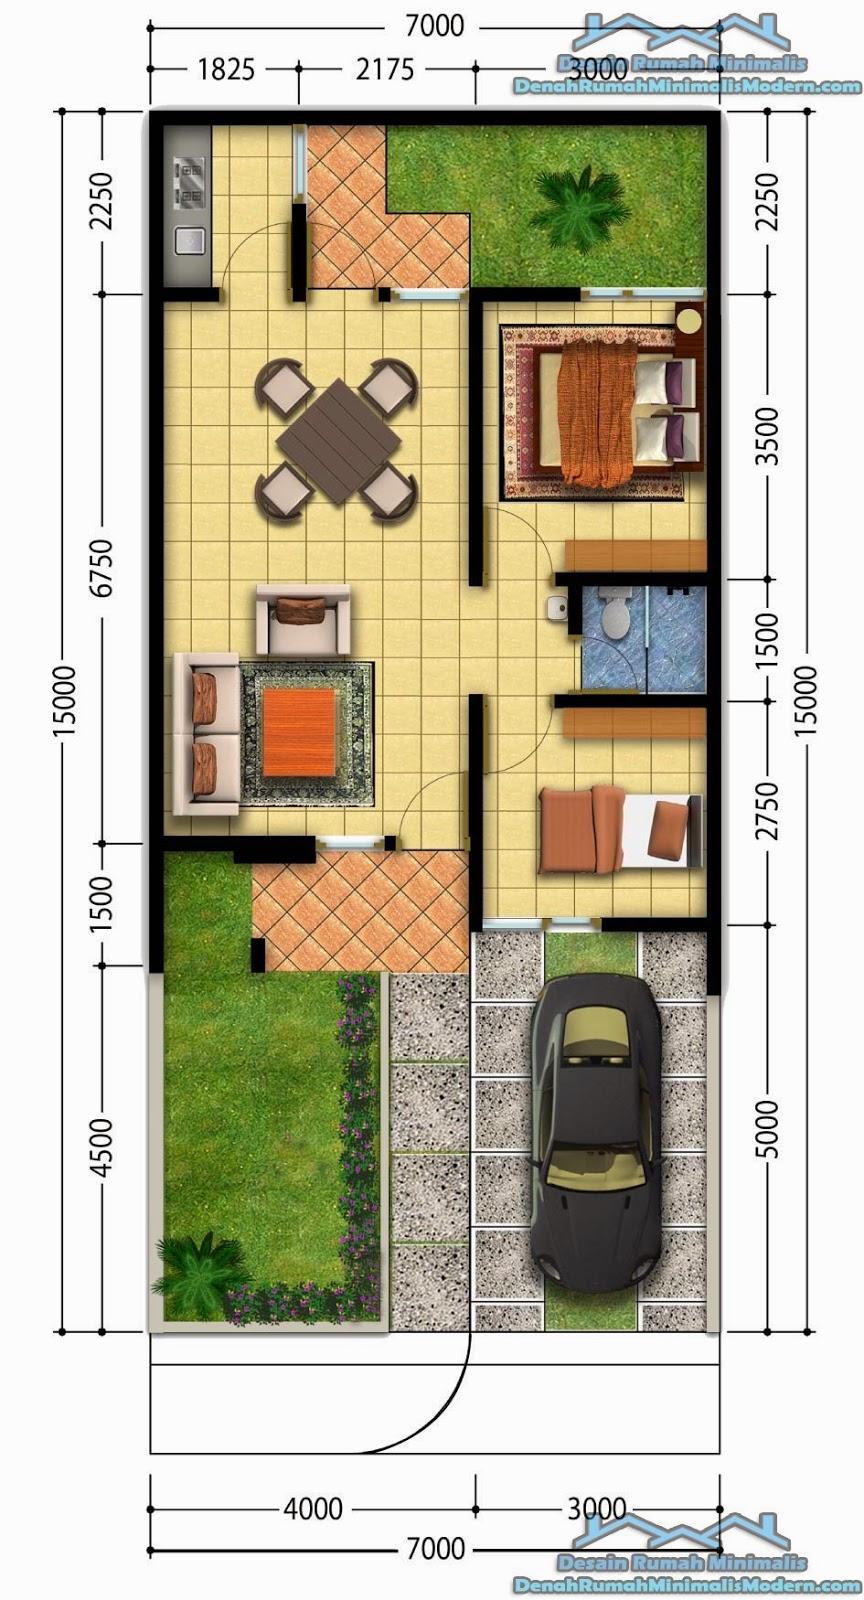 Denah Rumah Minimalis Modern 1 Lantai Terbaru 2015 IndoTerbaikCom